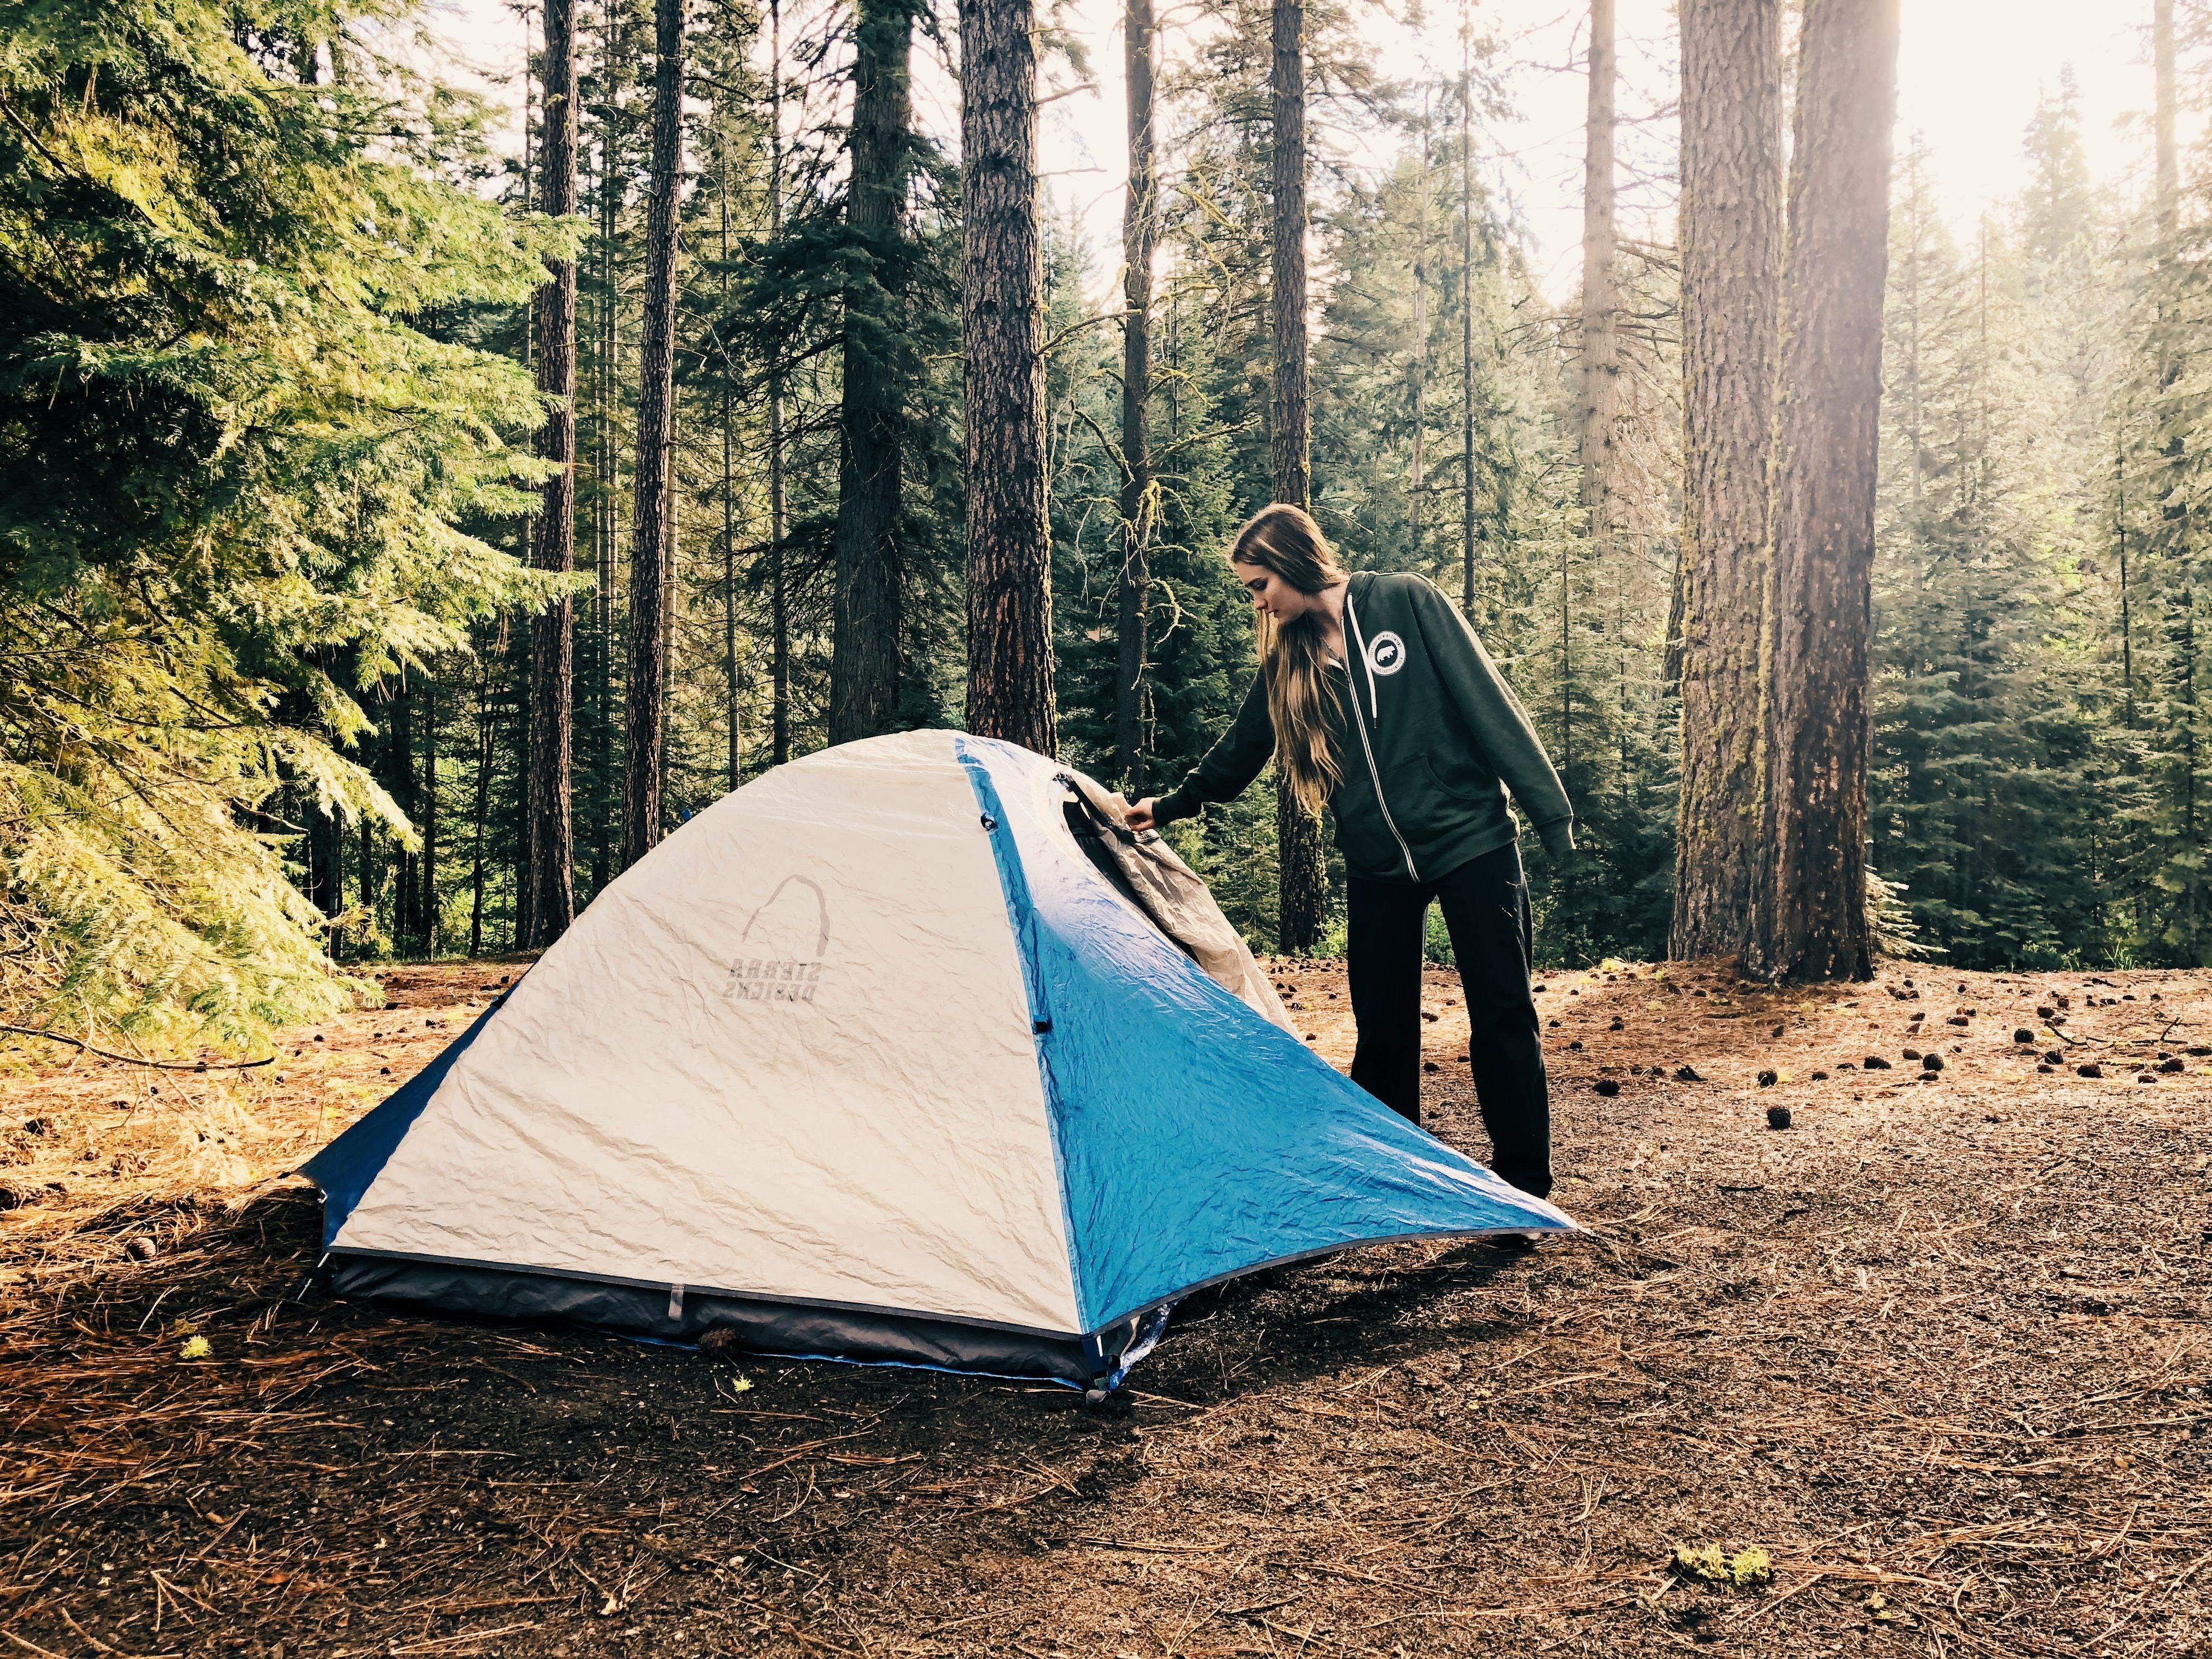 camping on a ski trip